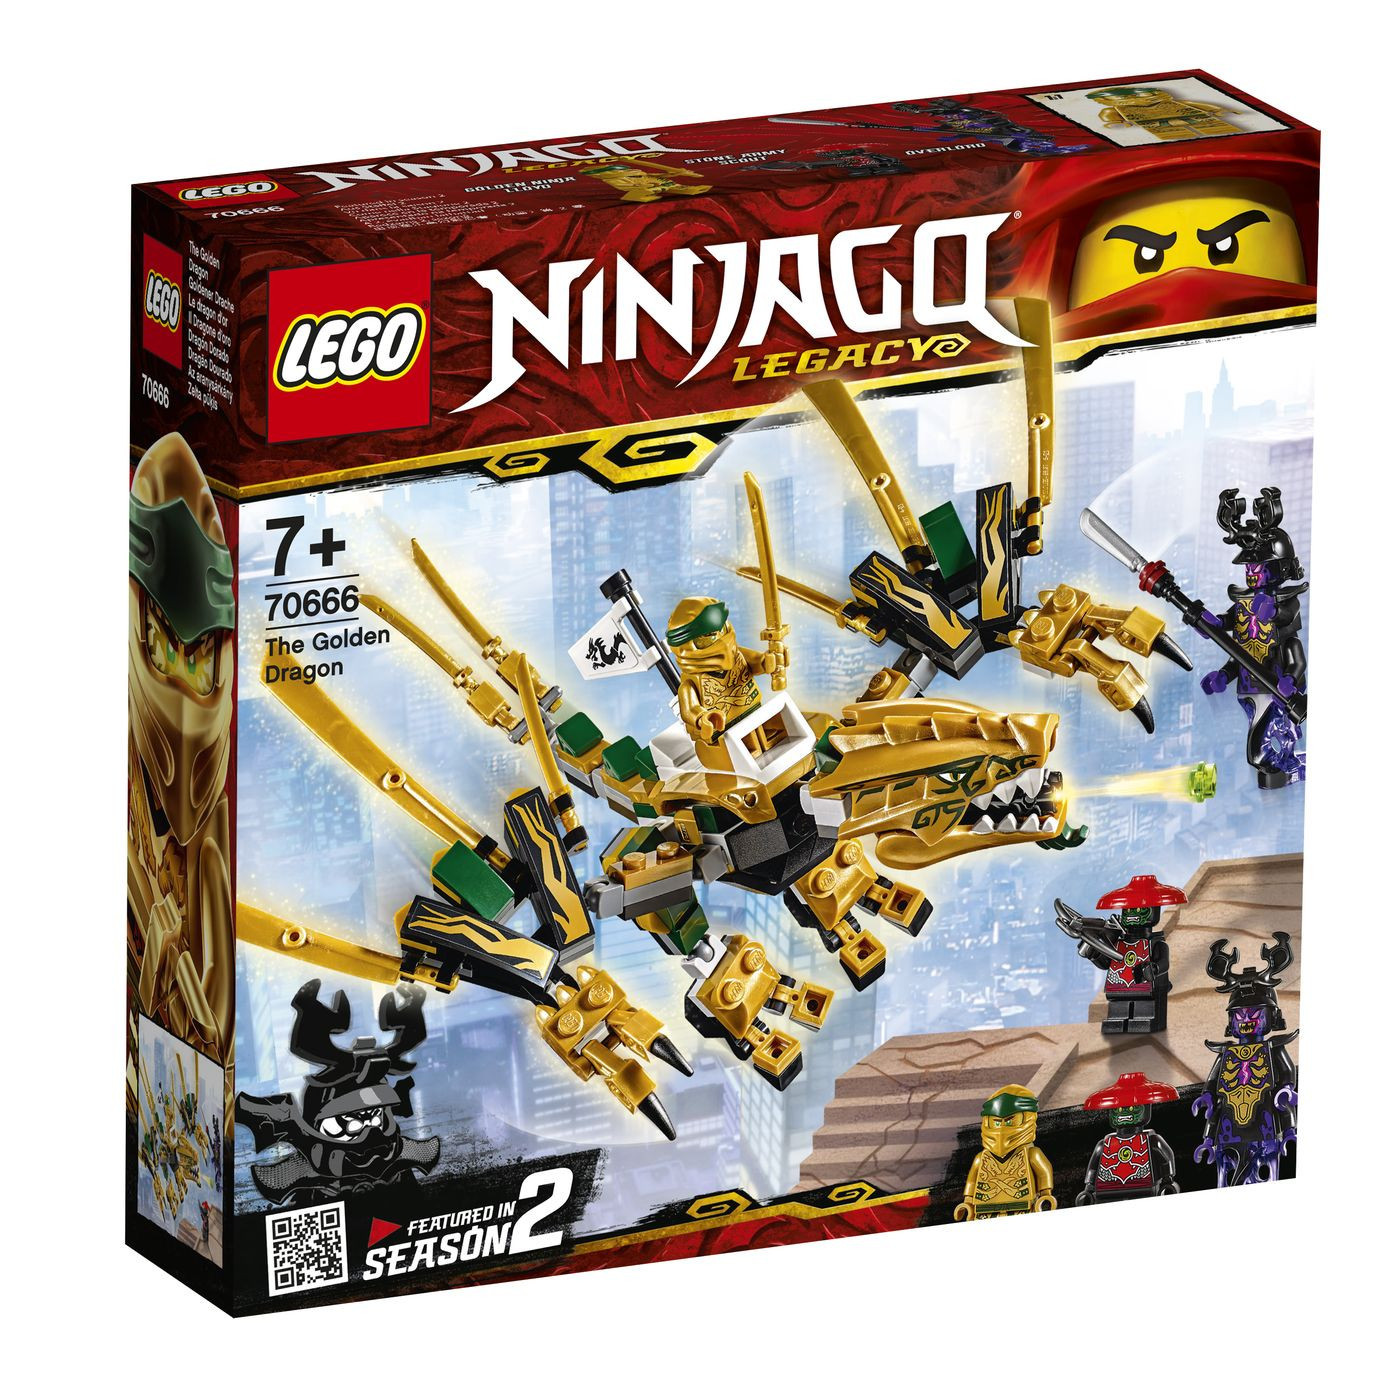 Lego ninjago golden dragon sets uceris steroid